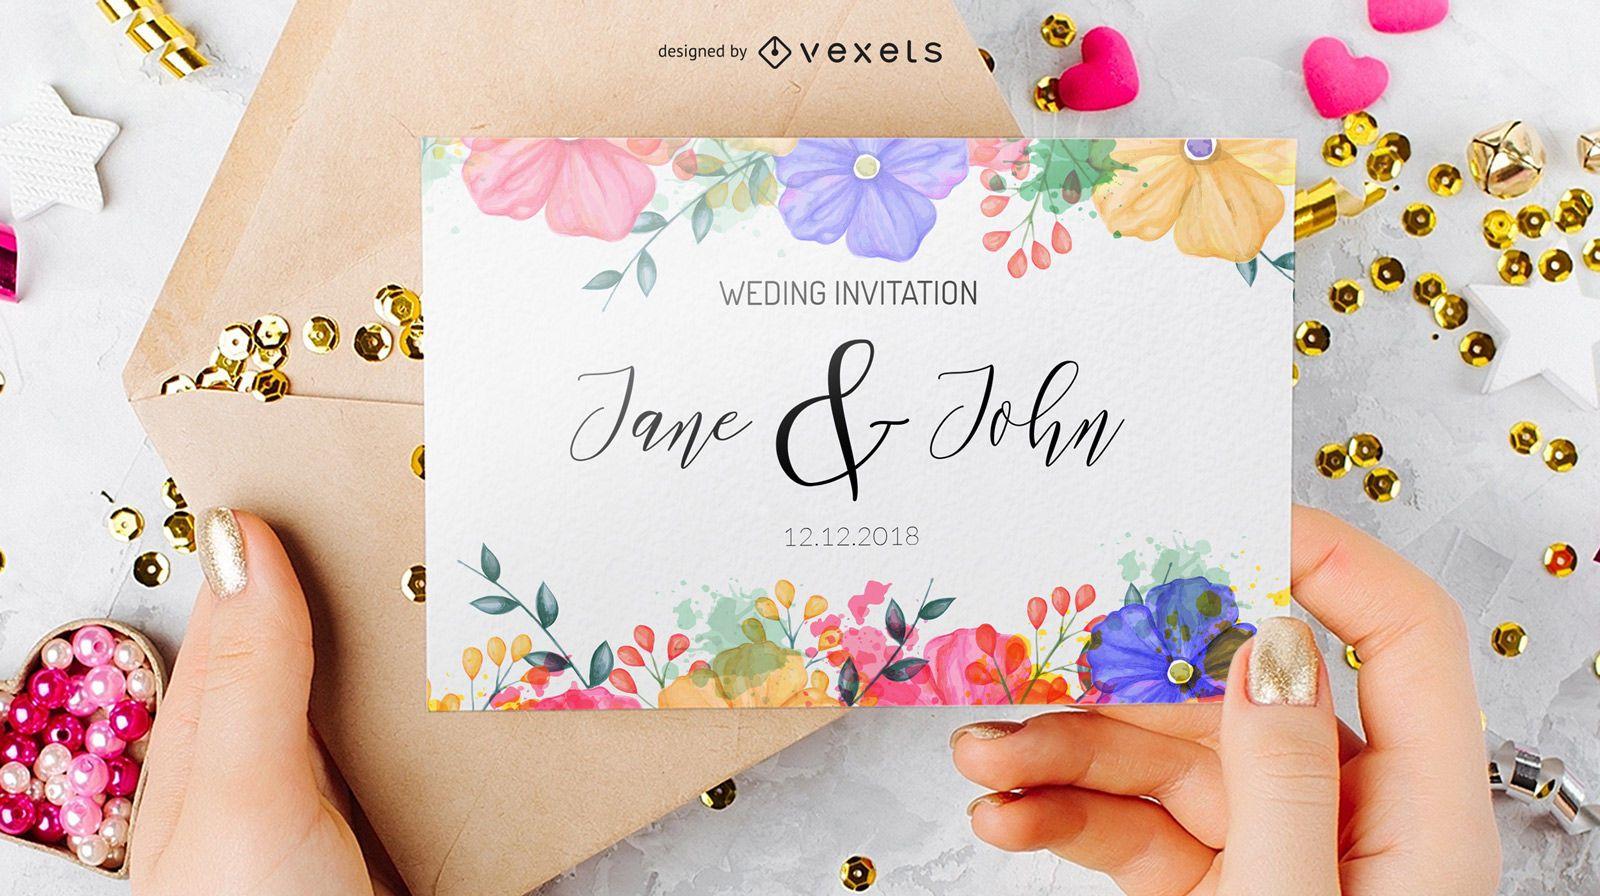 Aquarellart-Hochzeits-Einladungs-Entwurf